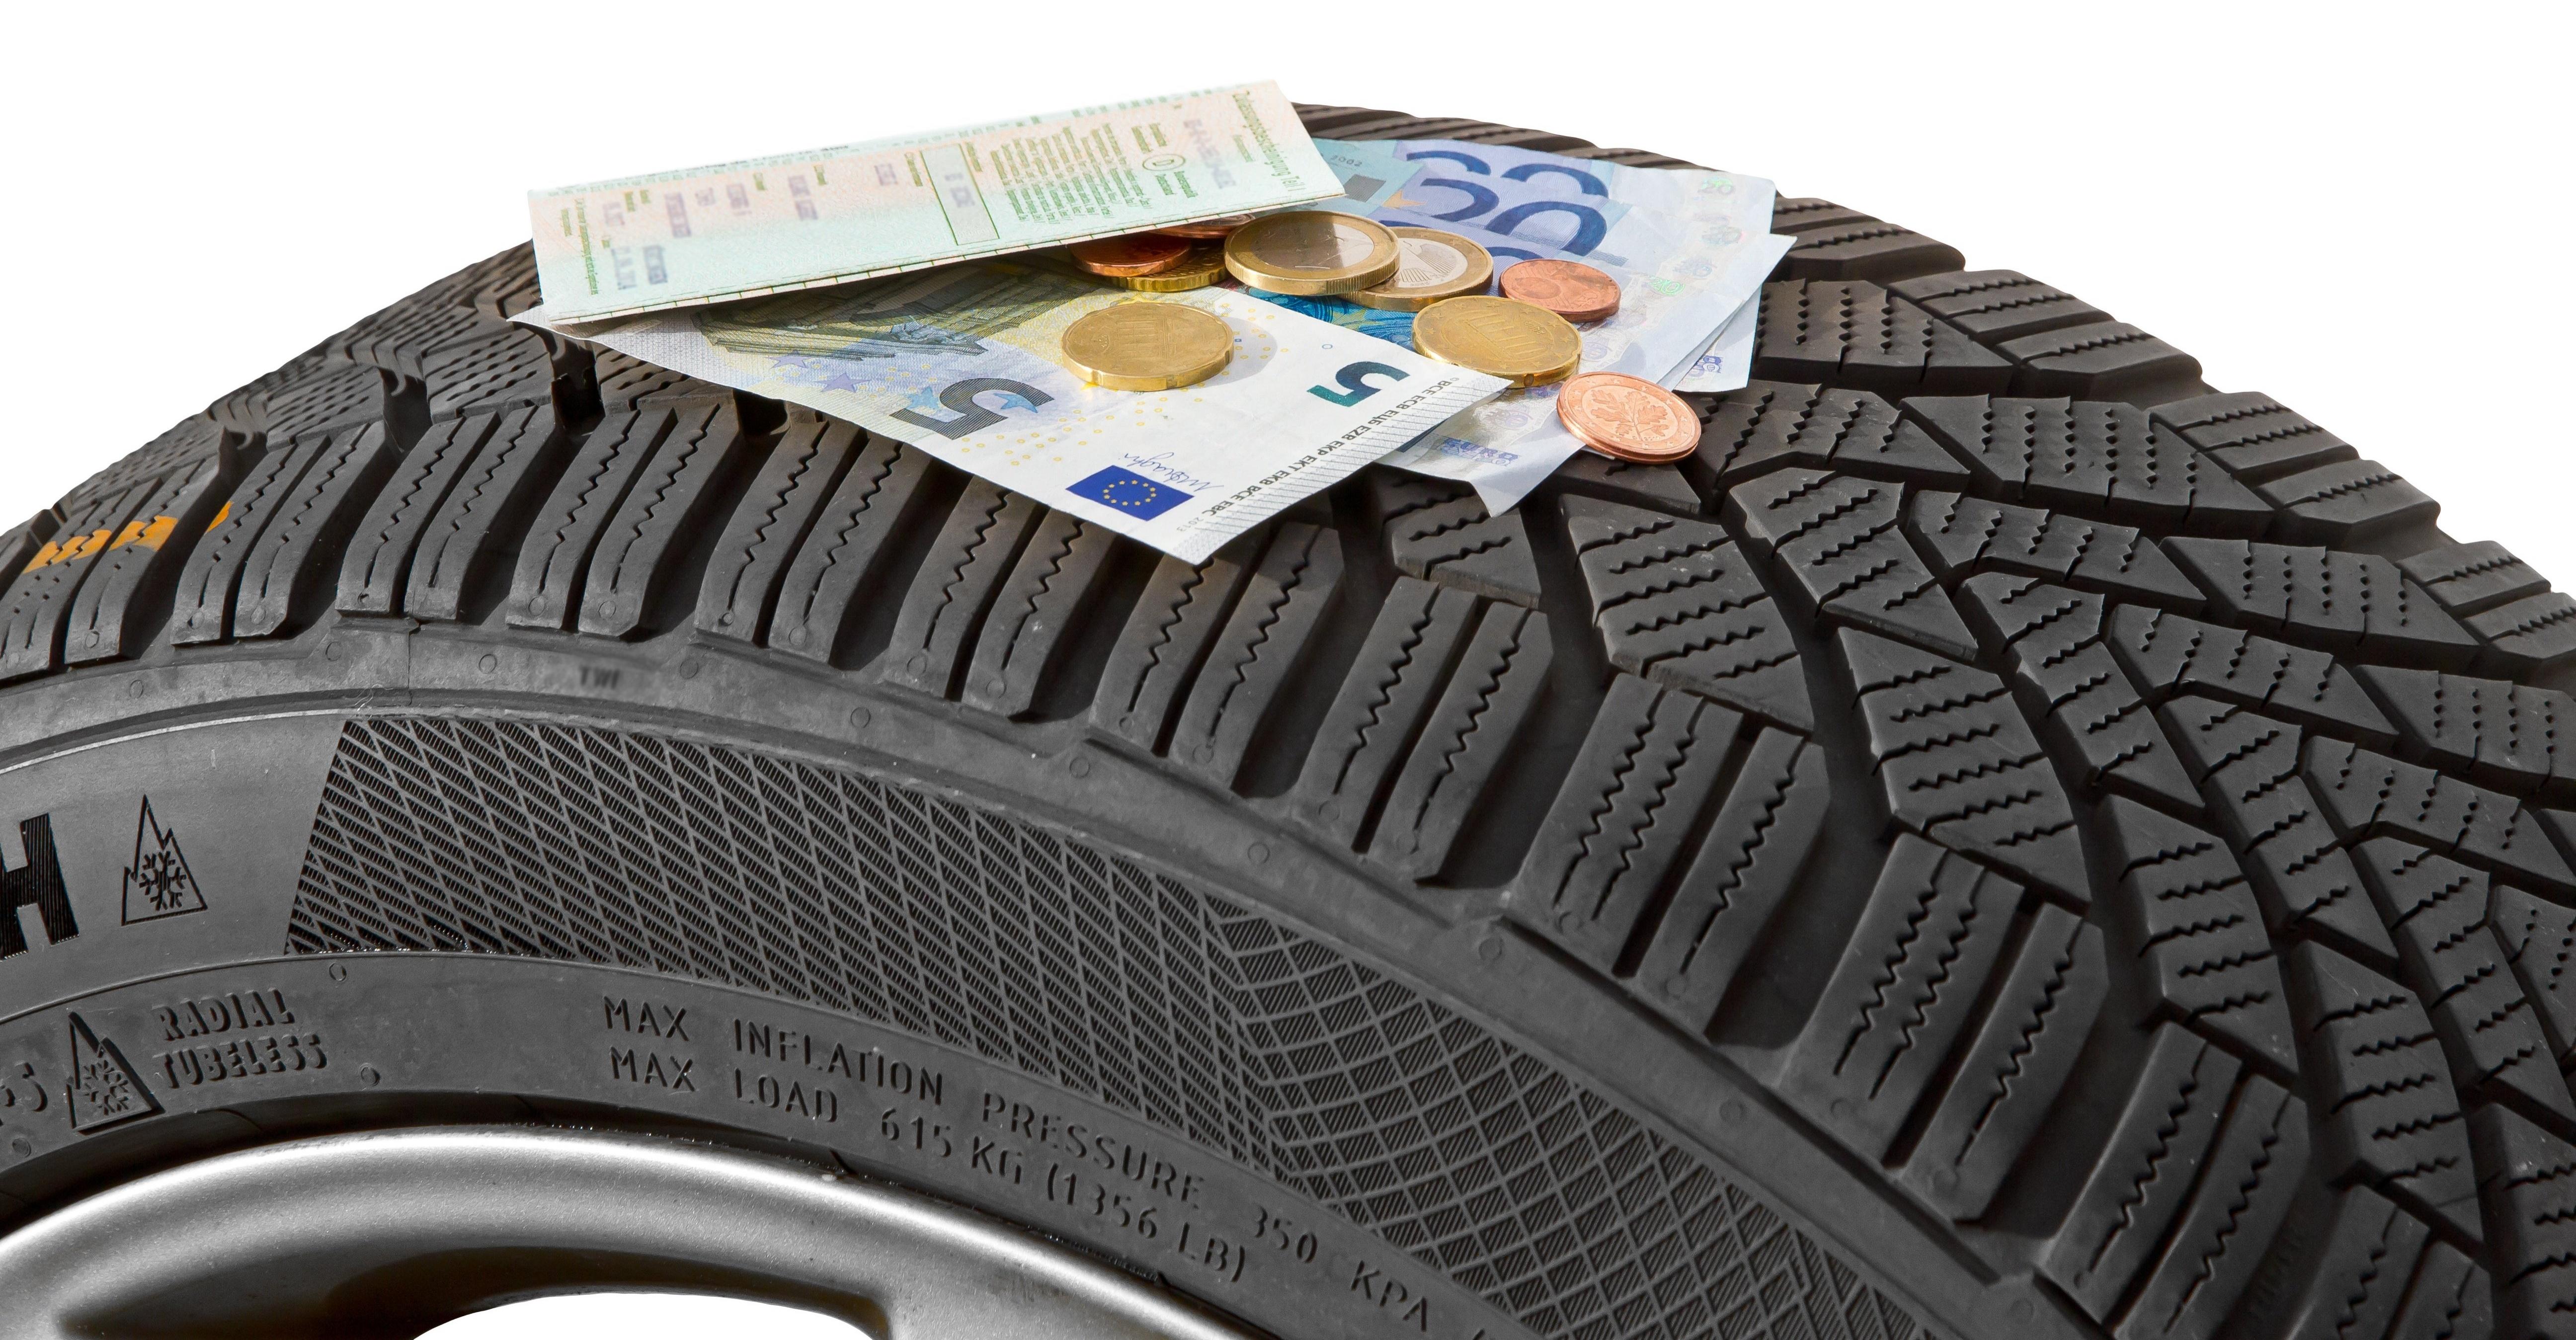 3-autobandencheck-banden-winter-winterband-de-beste-prijs-kwaliteitsverhouding-volgens-autobandencheck.nl-966220-edited